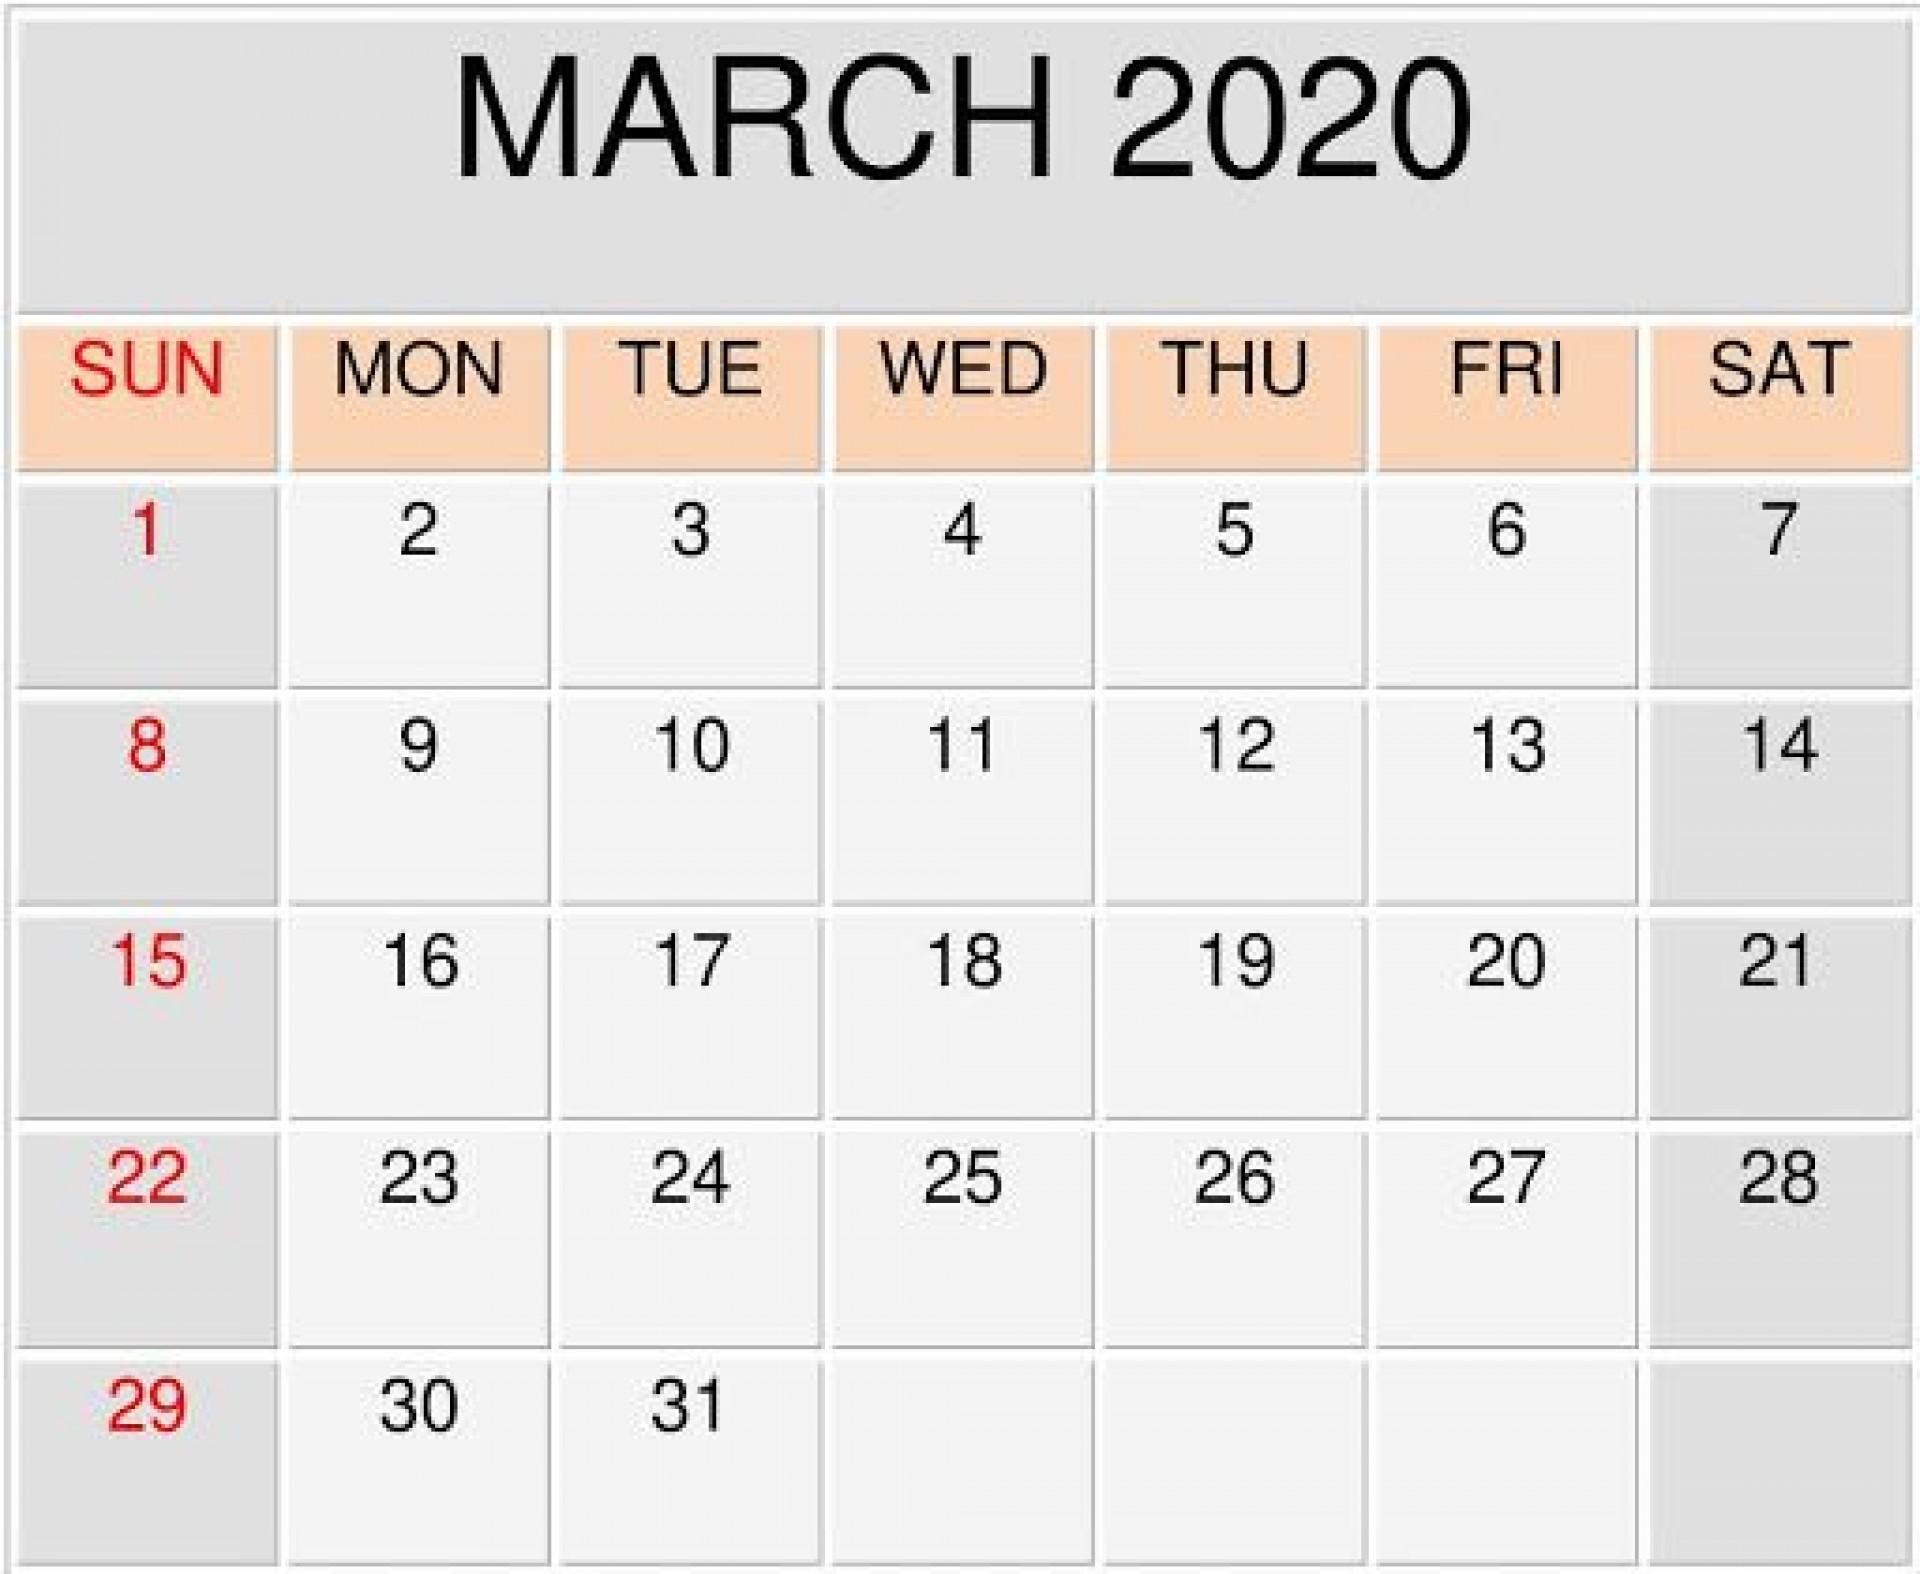 009 Unusual Blank Monthly Calendar Template Google Doc Sample  Docs1920